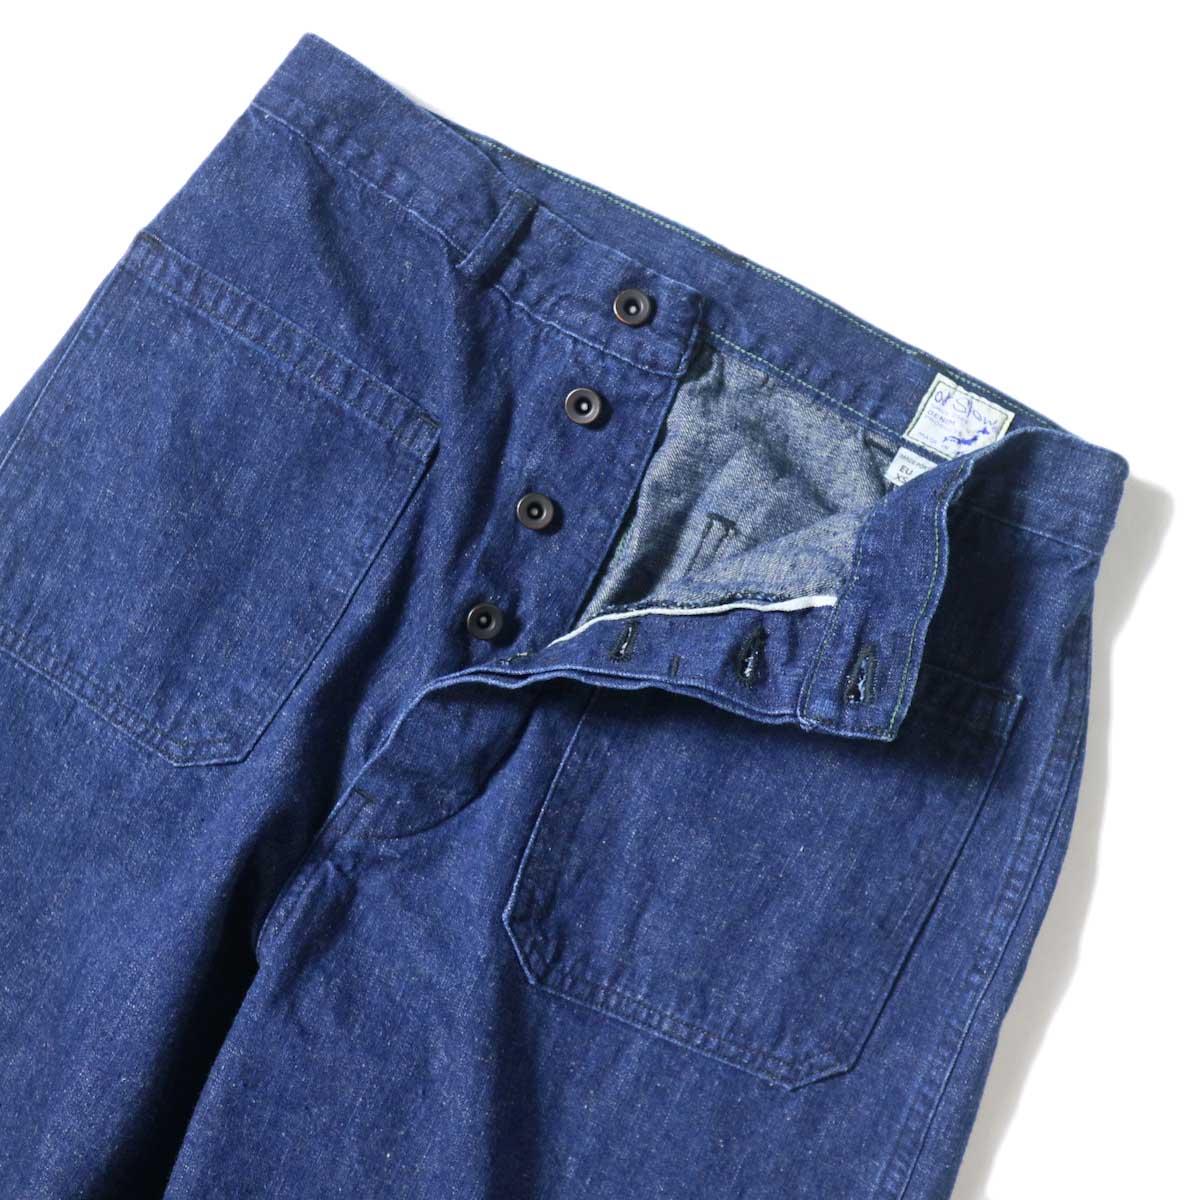 orSlow / US NAVY DENIM FLARE PANTS ウエストボタン